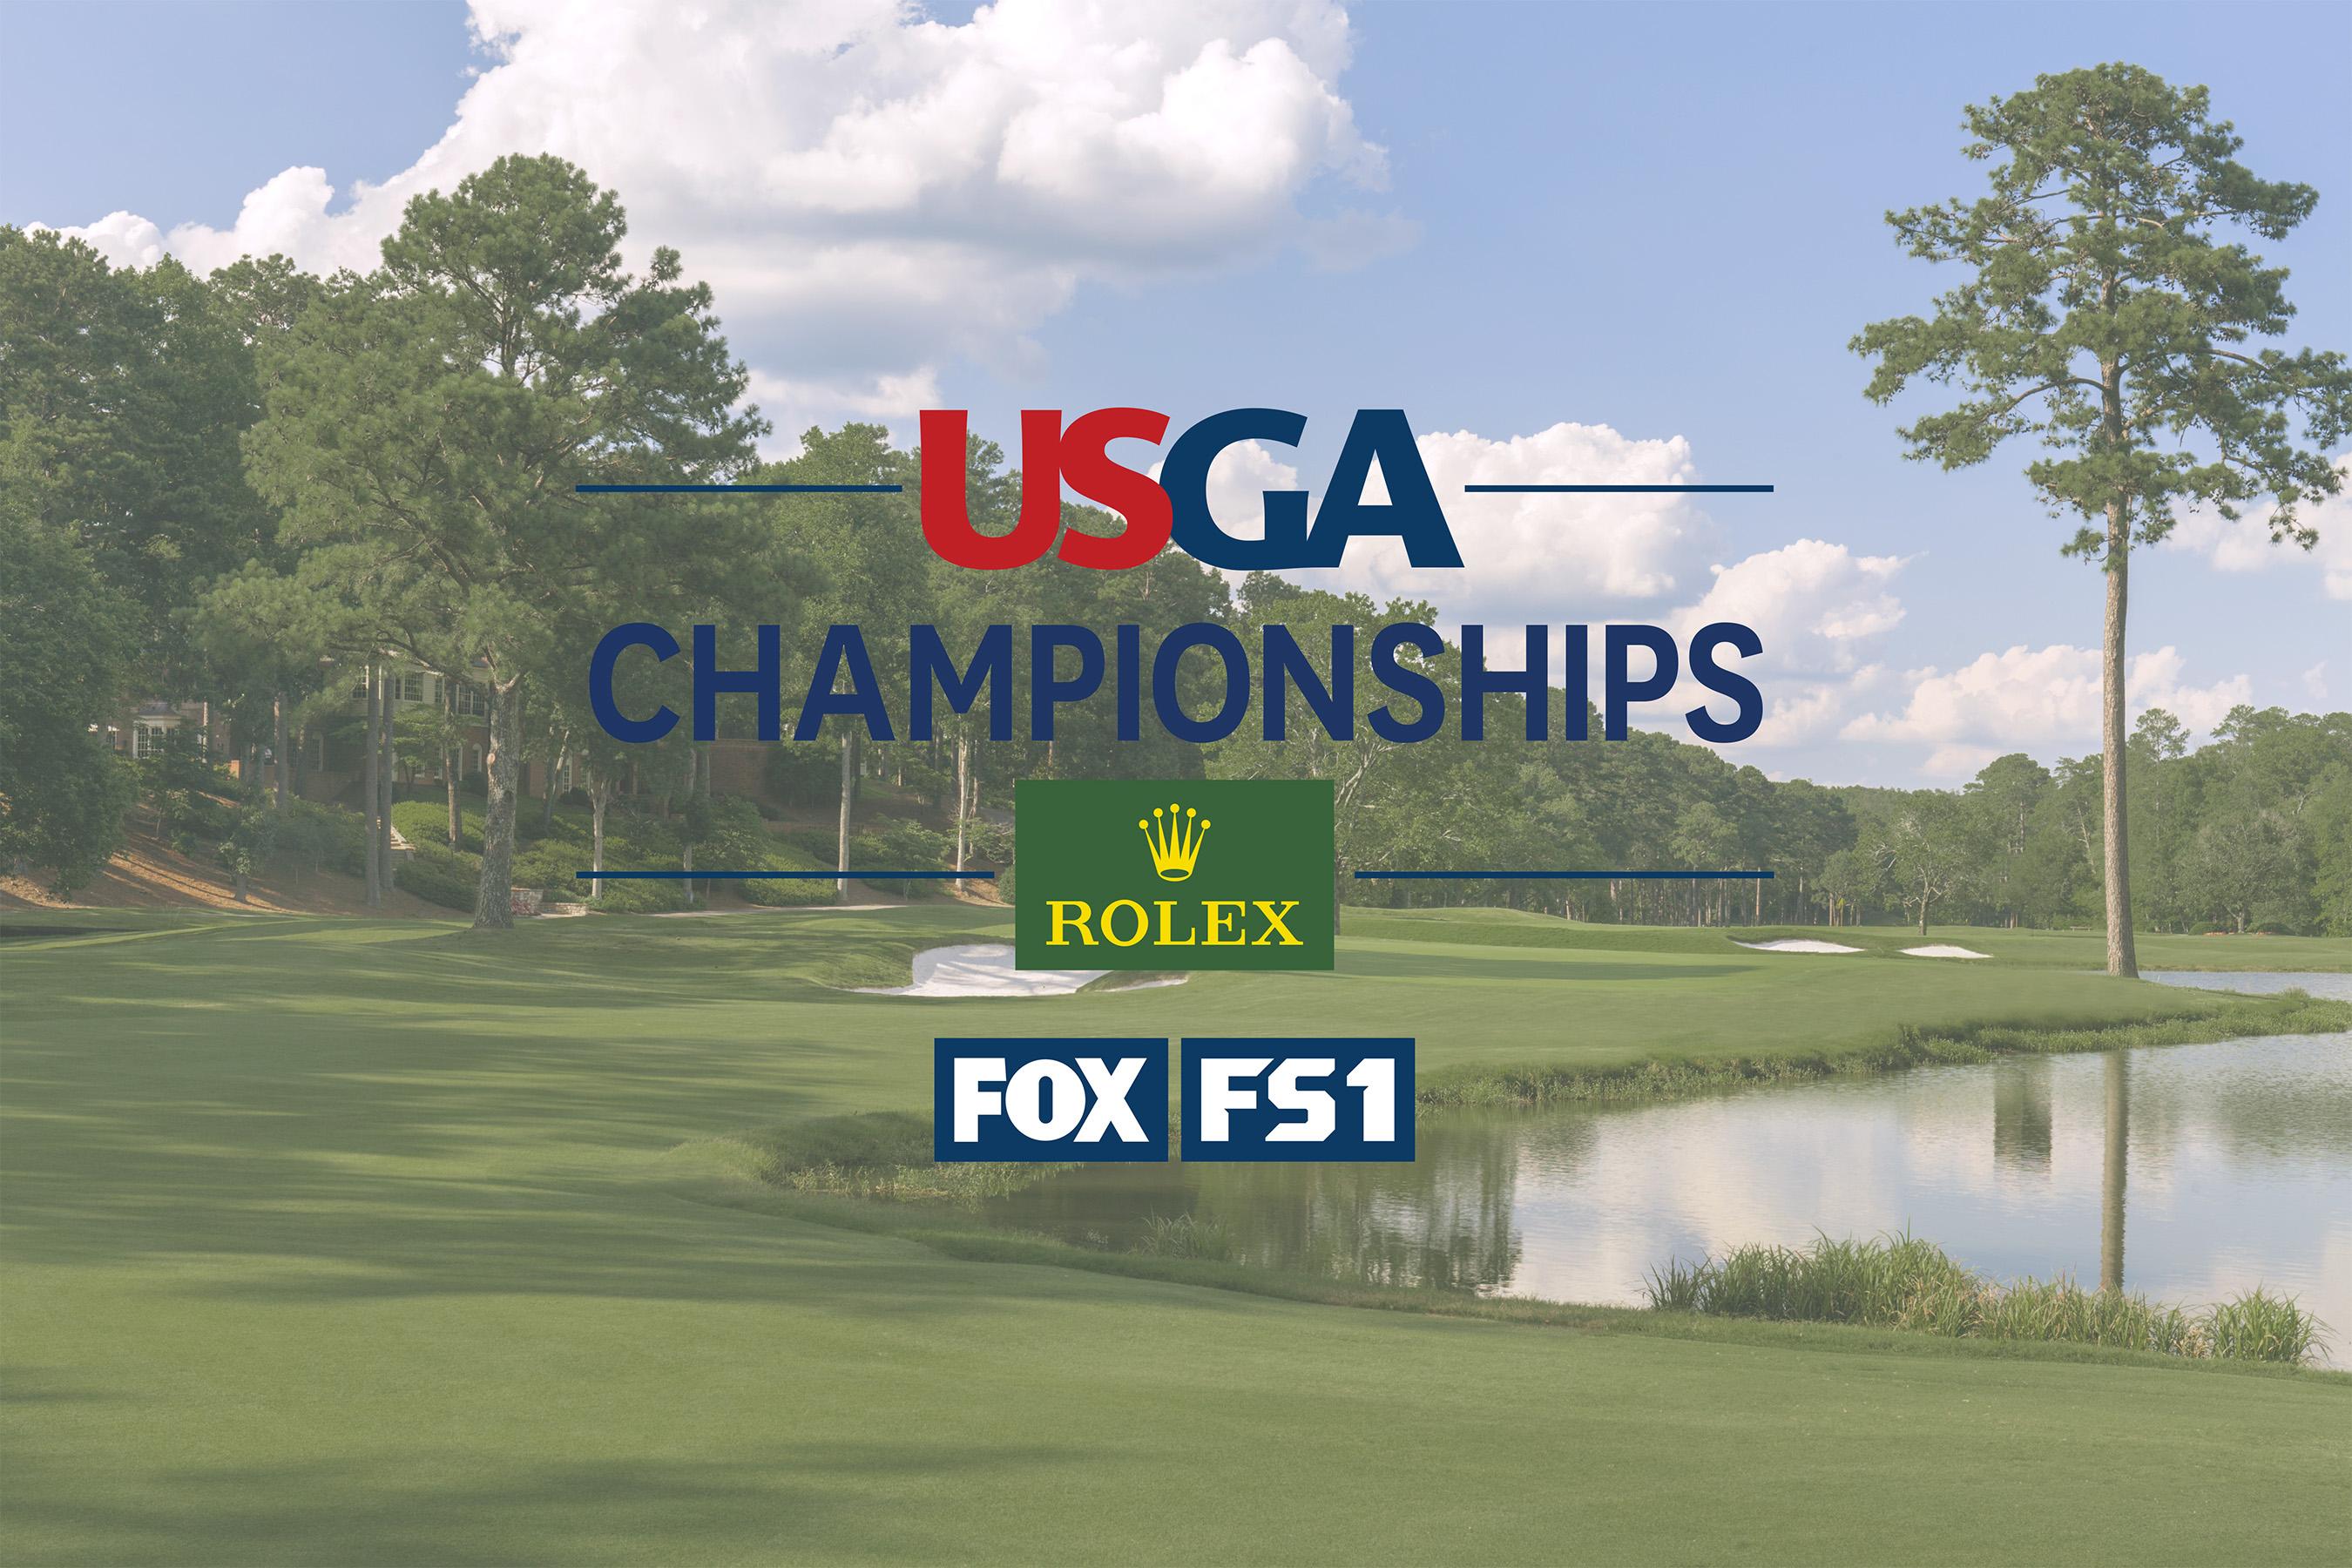 USGA Championships on FOX presented by Rolex